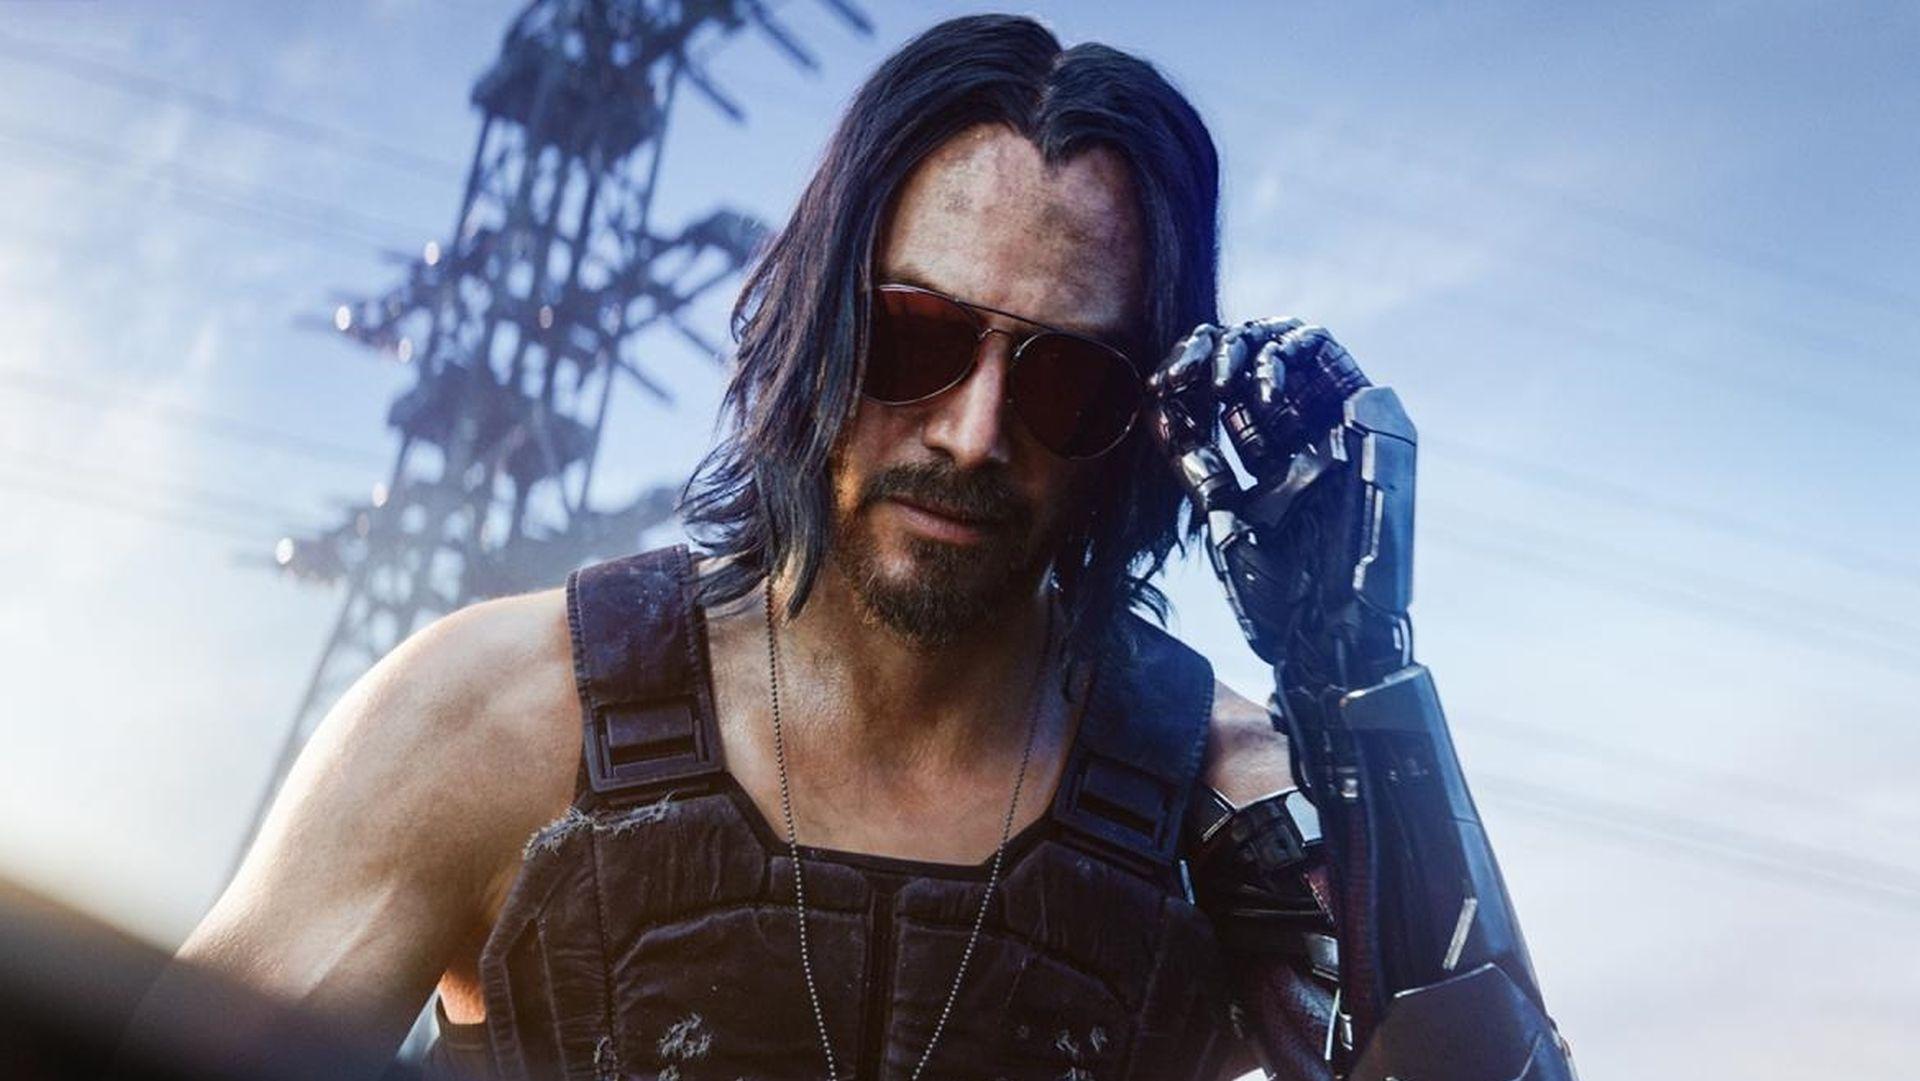 Keanu Reeves interpretando a Johnny Silverhand - Cyberpunk 2077